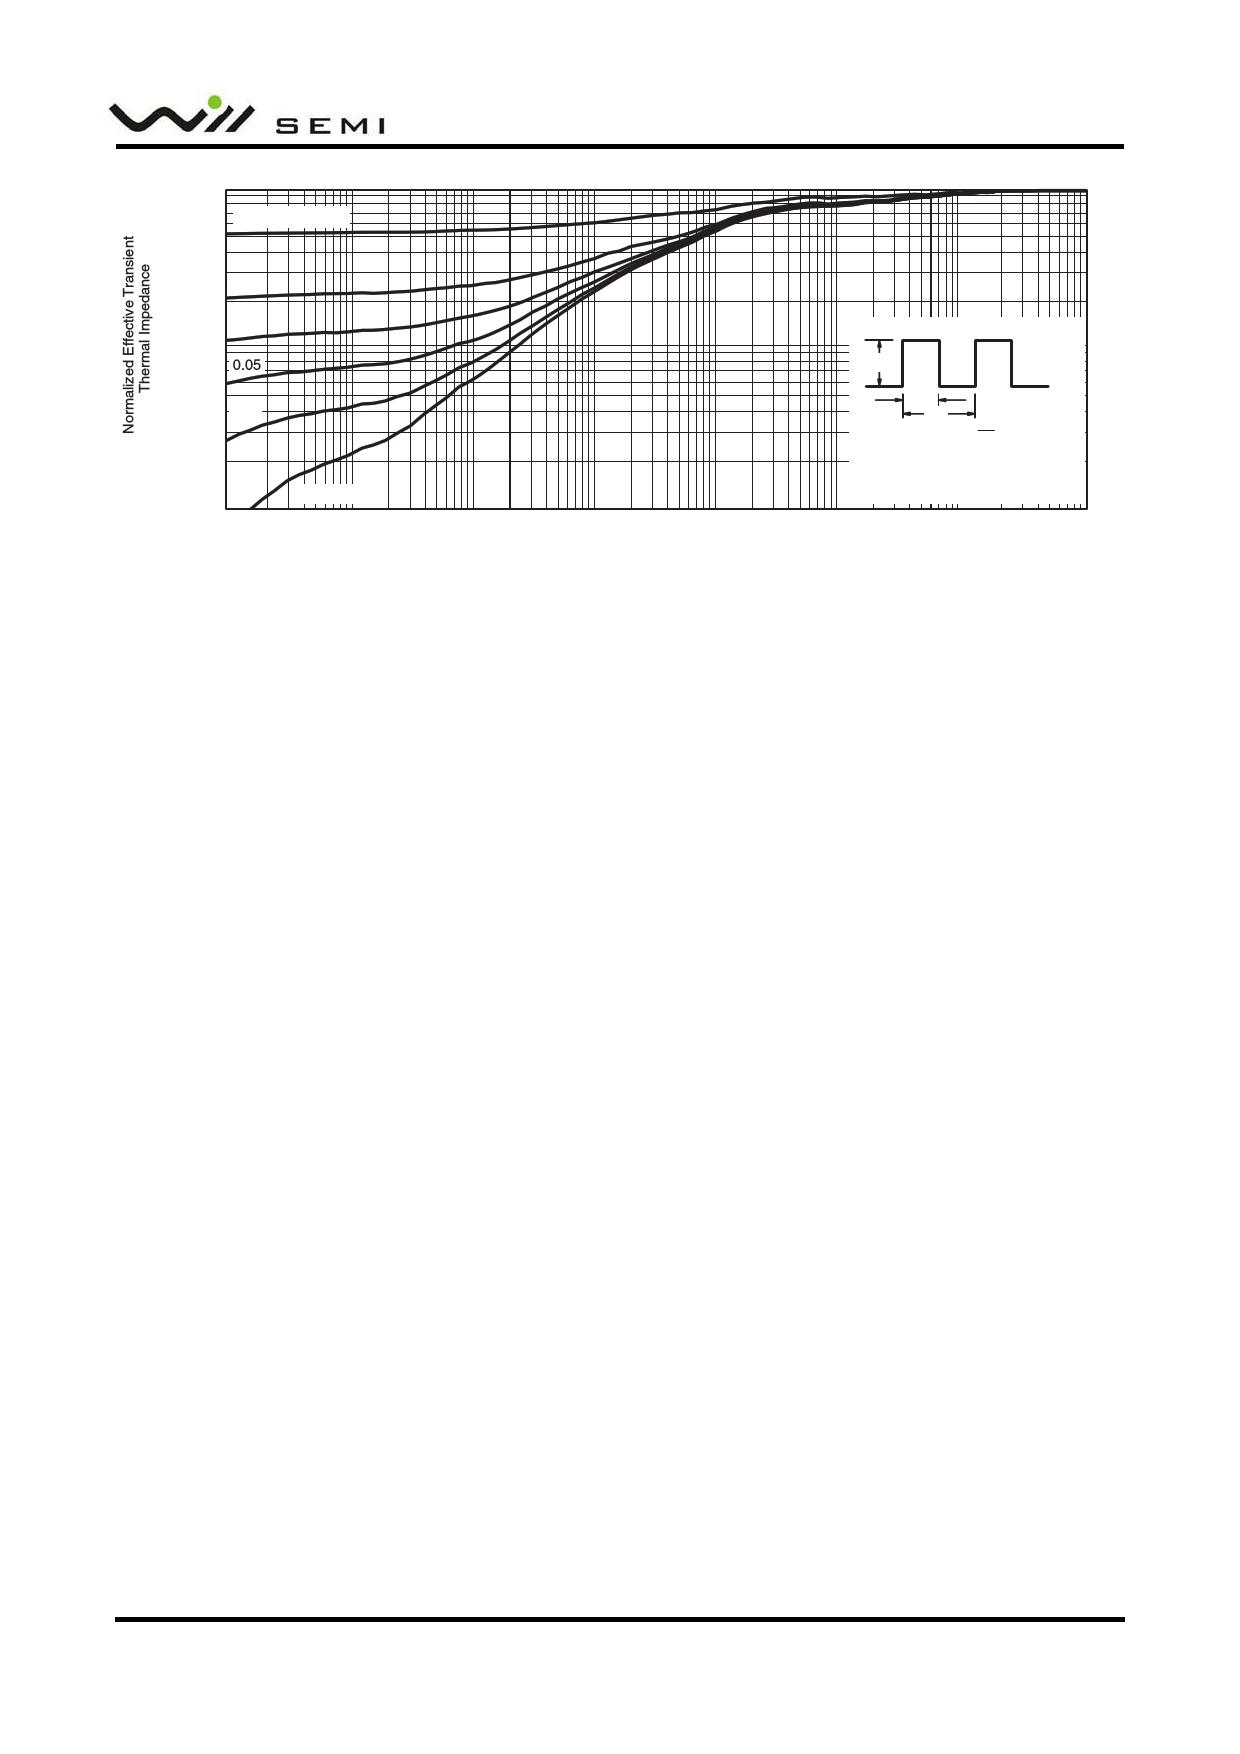 WPM2015 Datasheet, Funktion